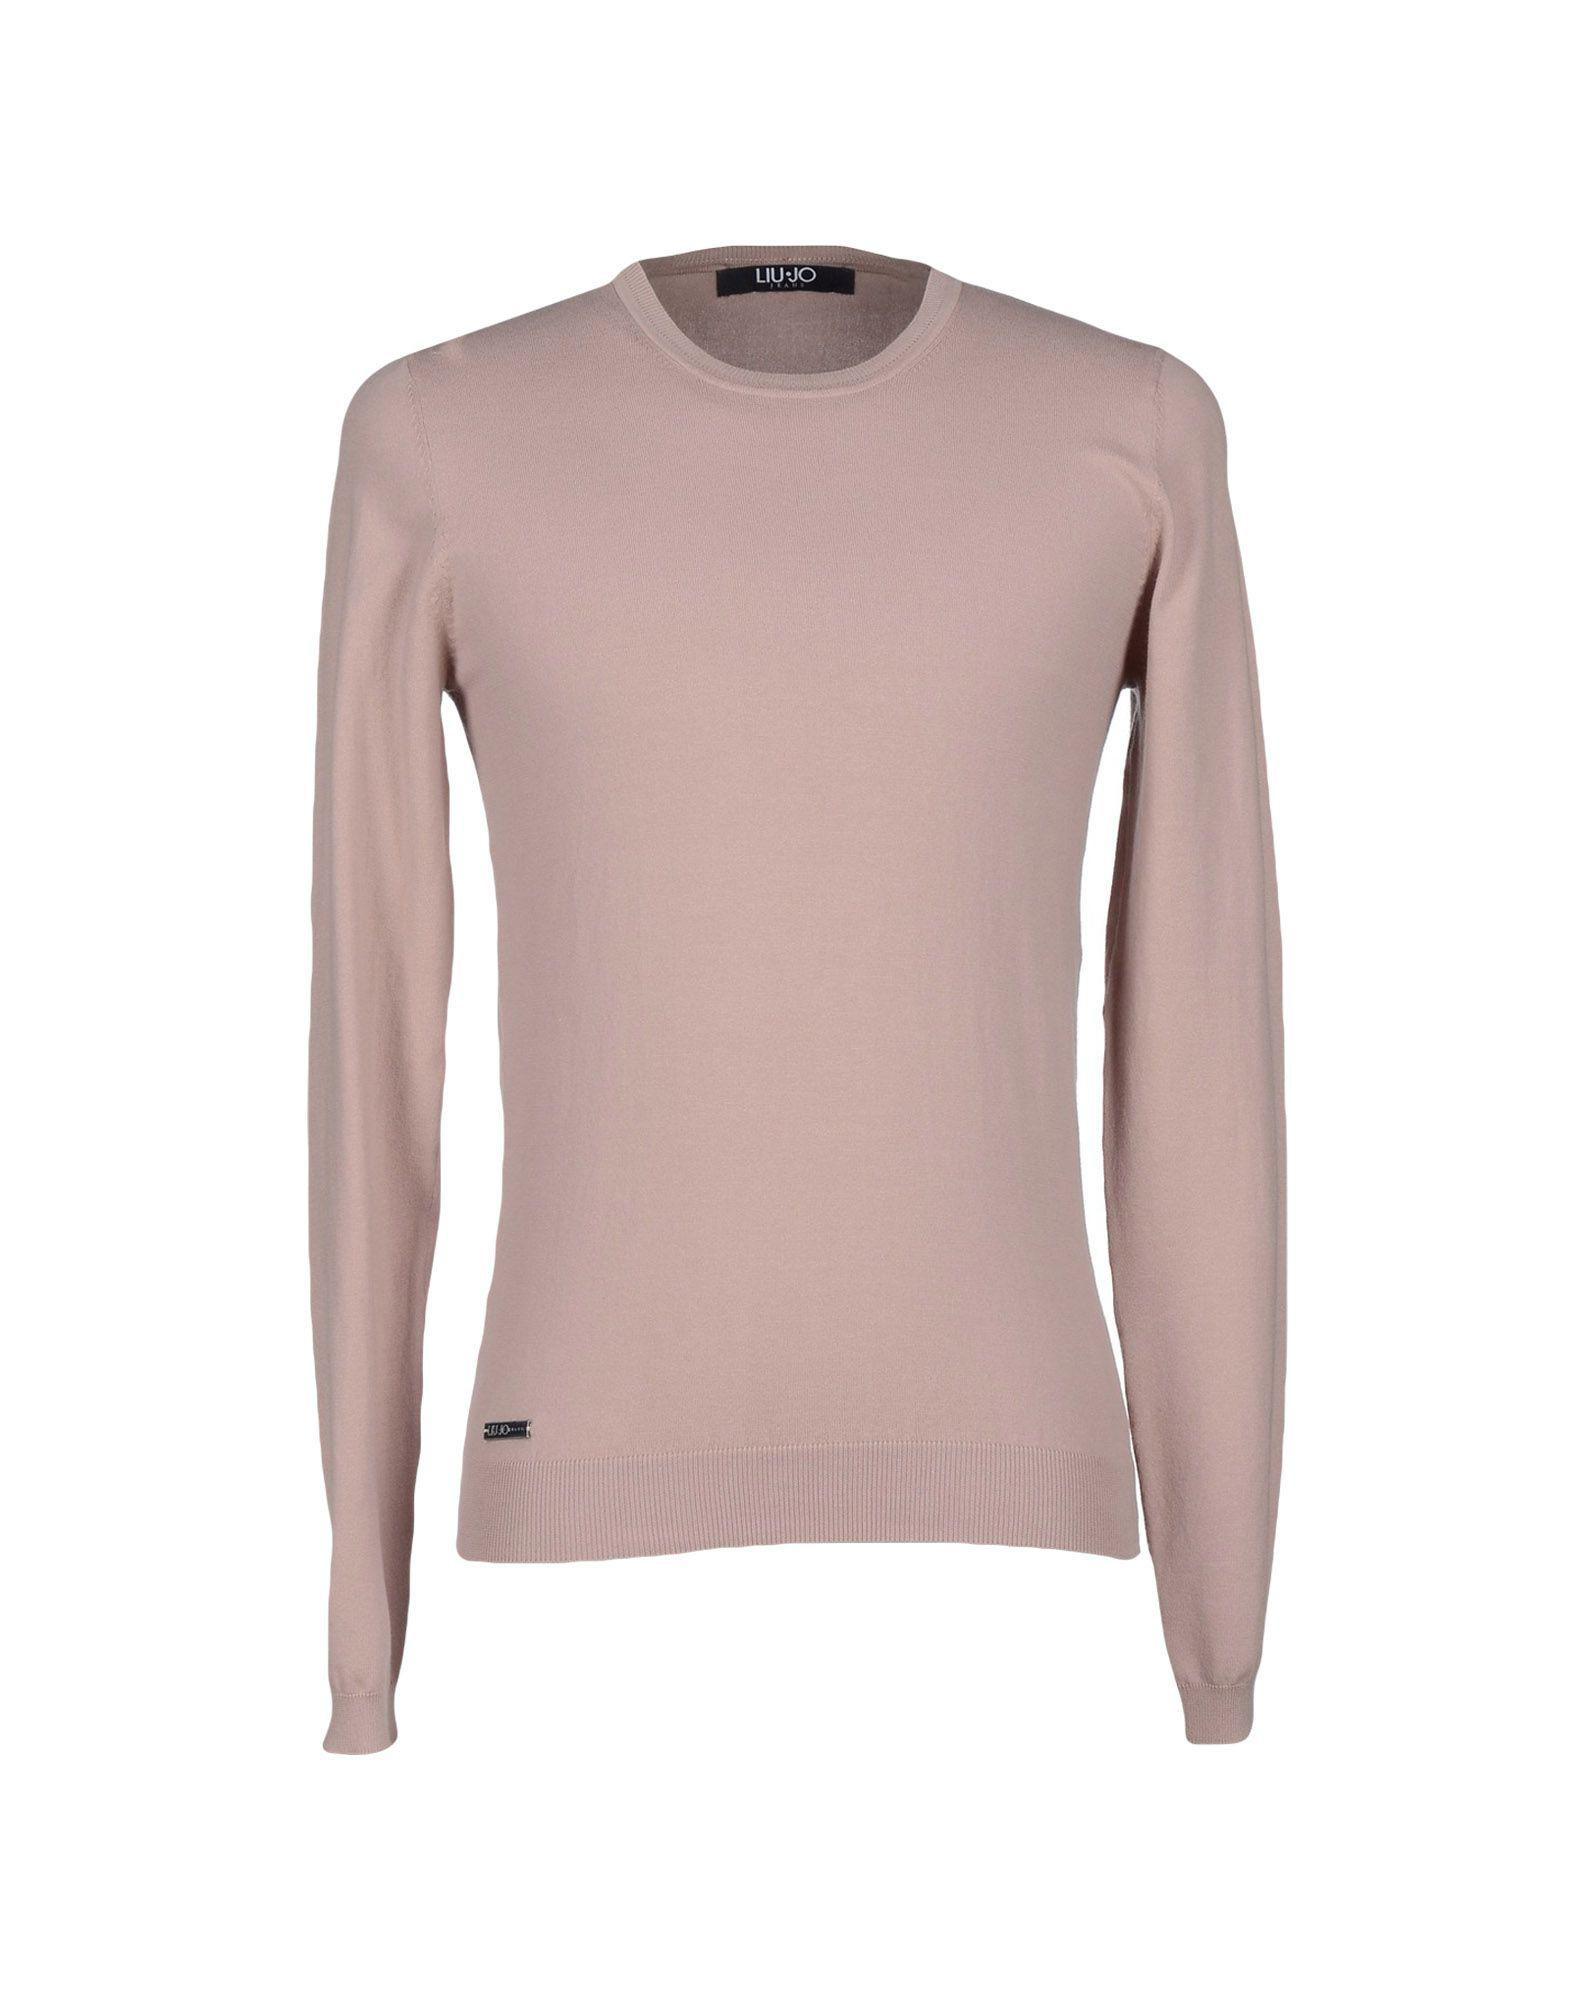 Liu •jo Sweater In Dove Grey